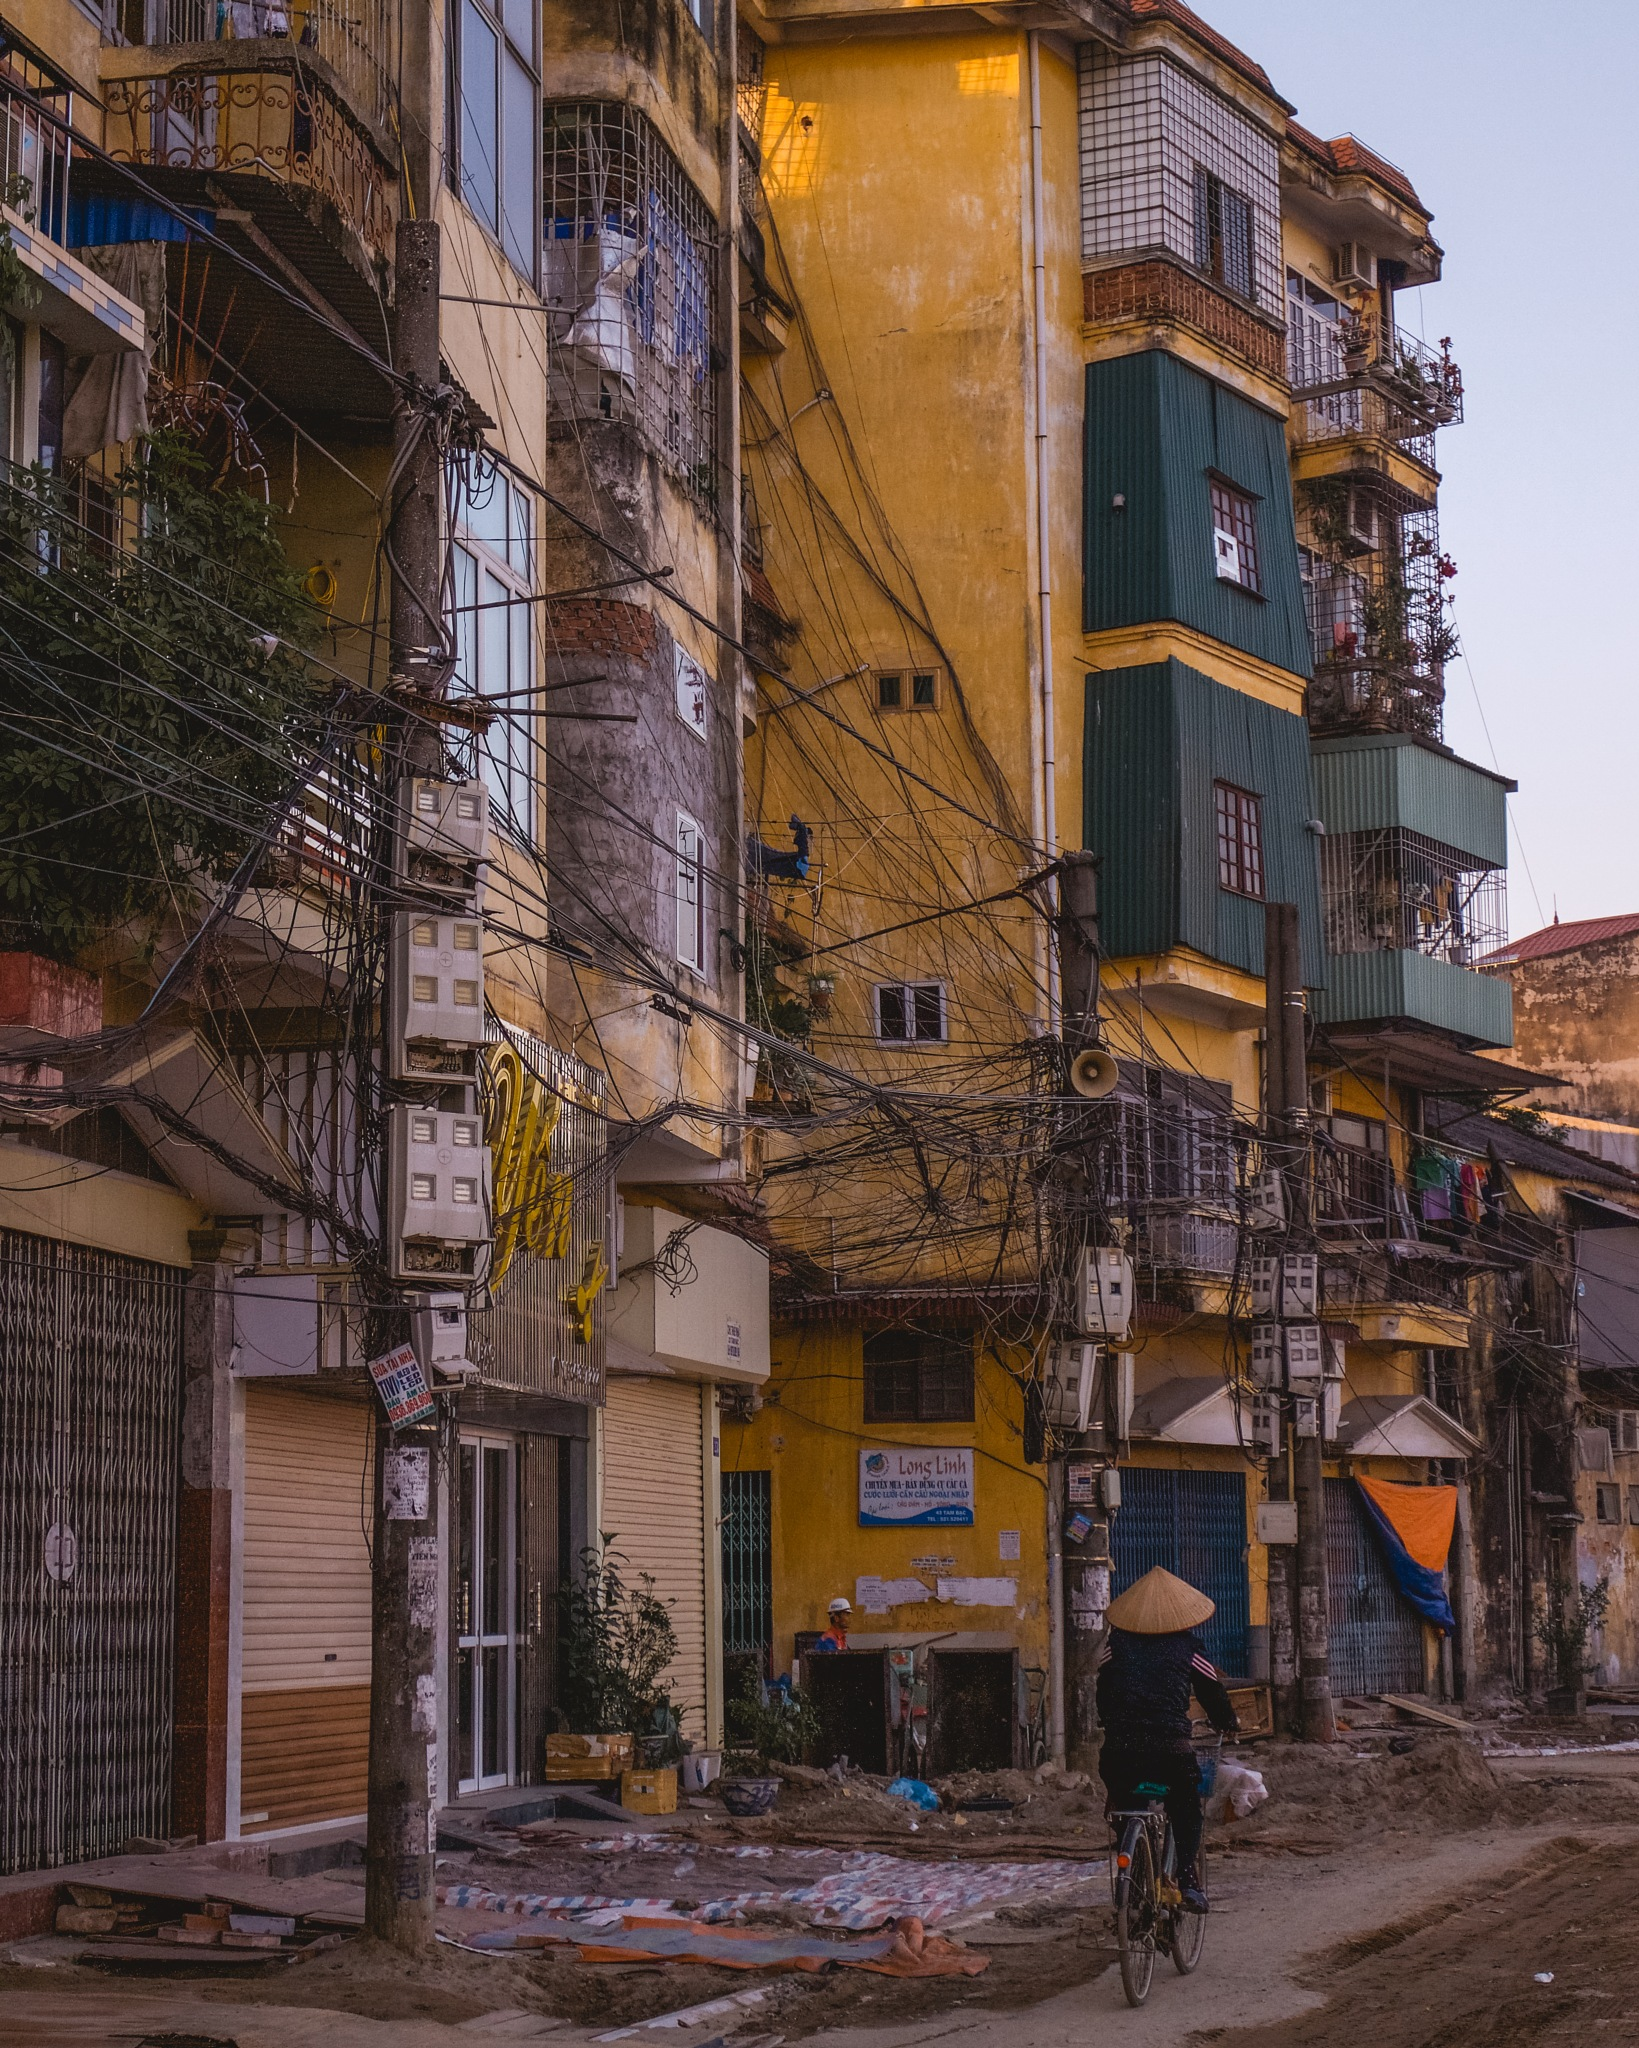 Streets of Vietnam by Marina McKenzie